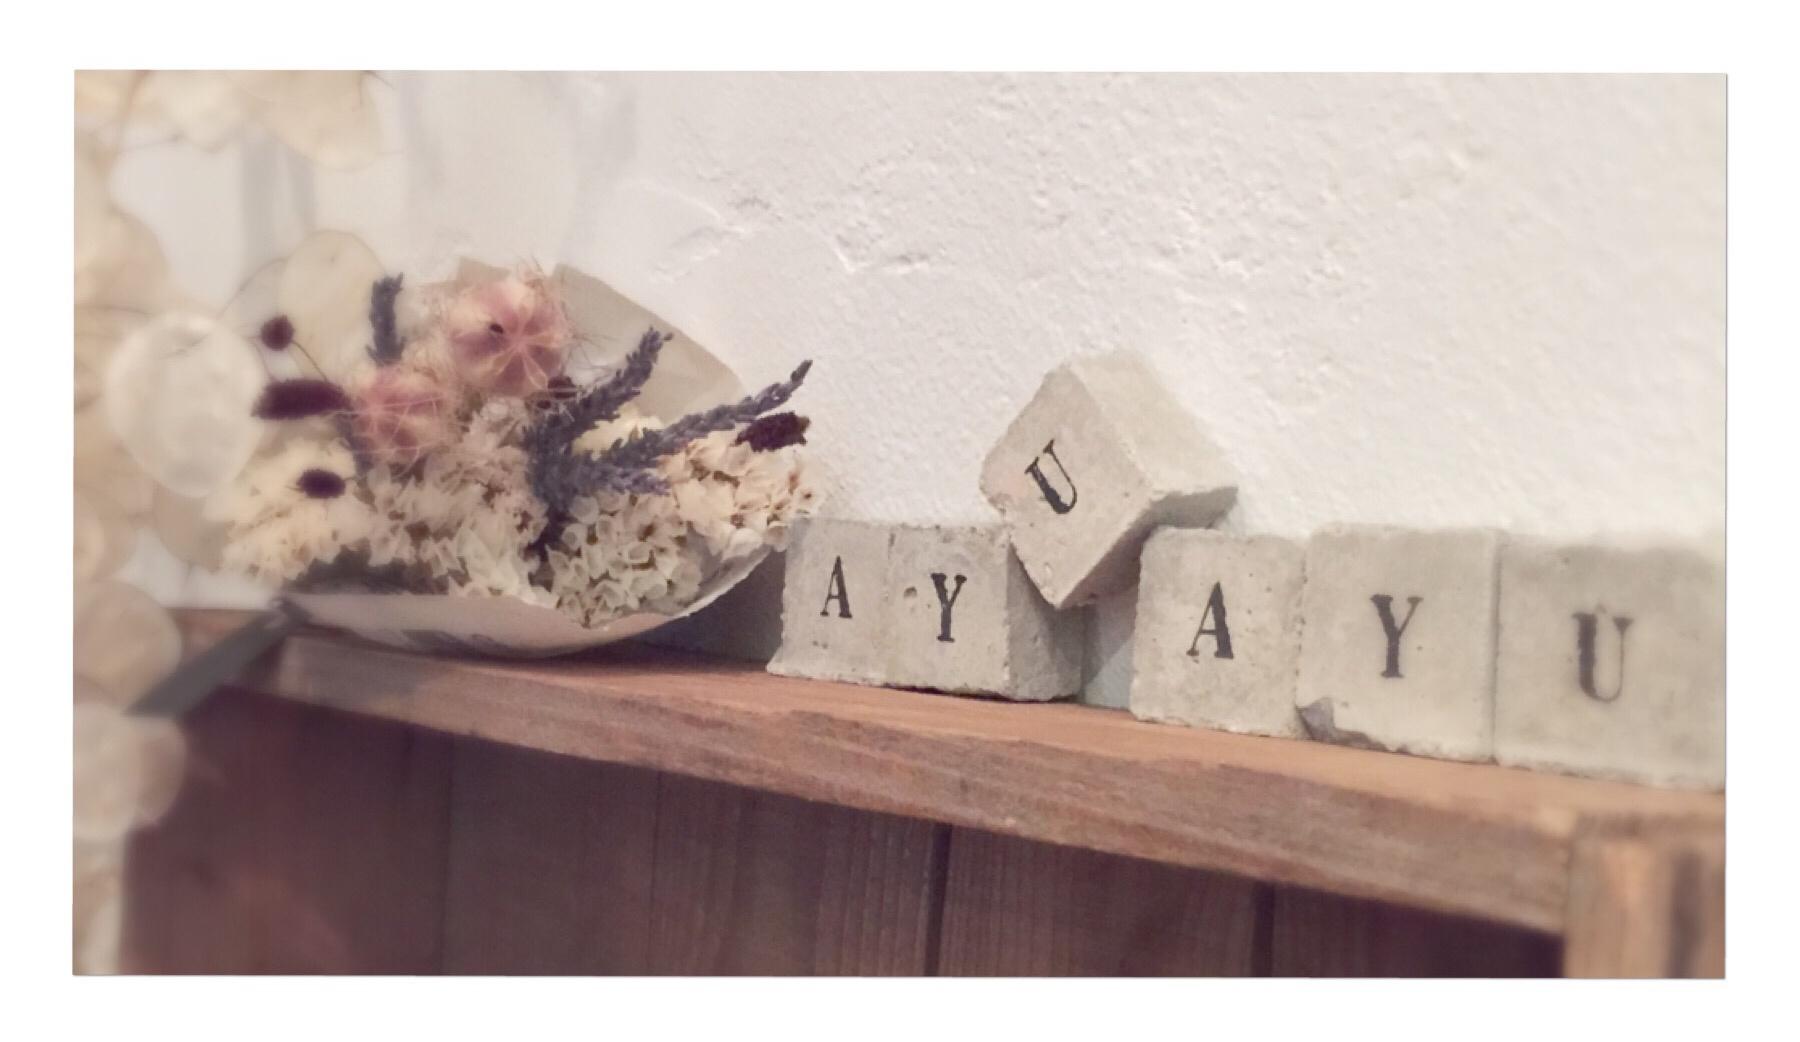 ayuayu** handmade